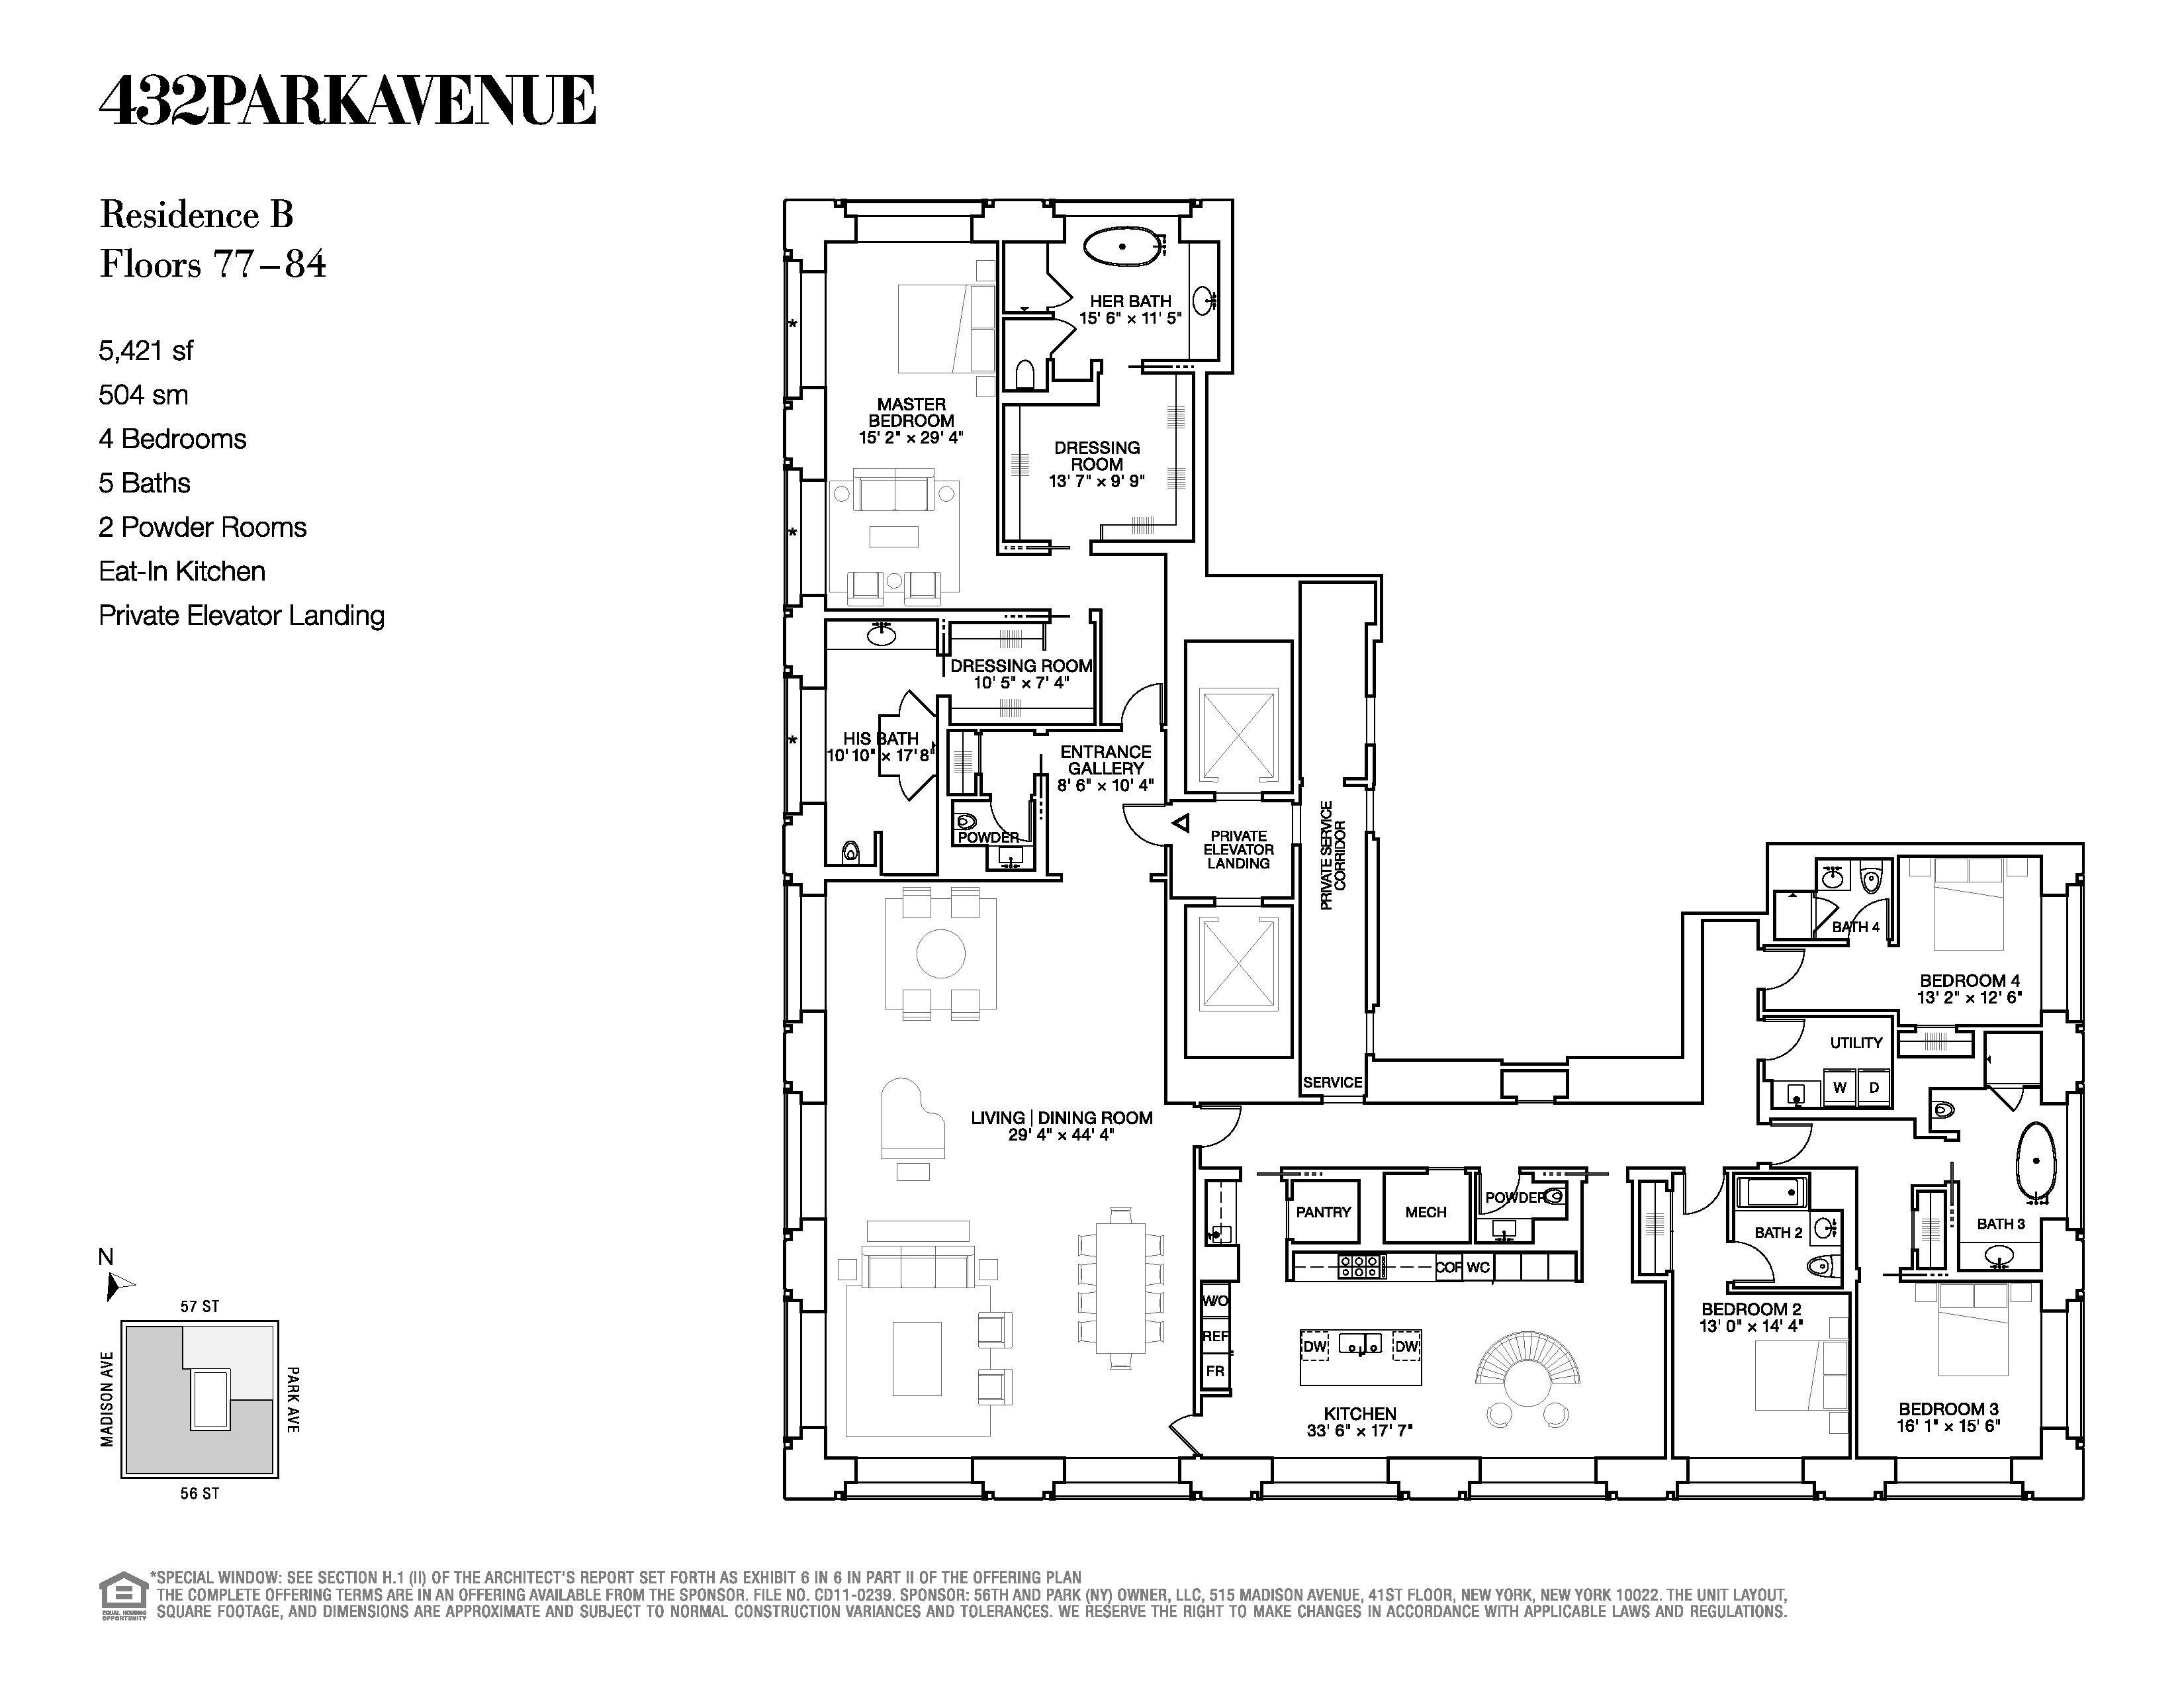 432 Park Avenue Floor Plans New York, USA Floor plans